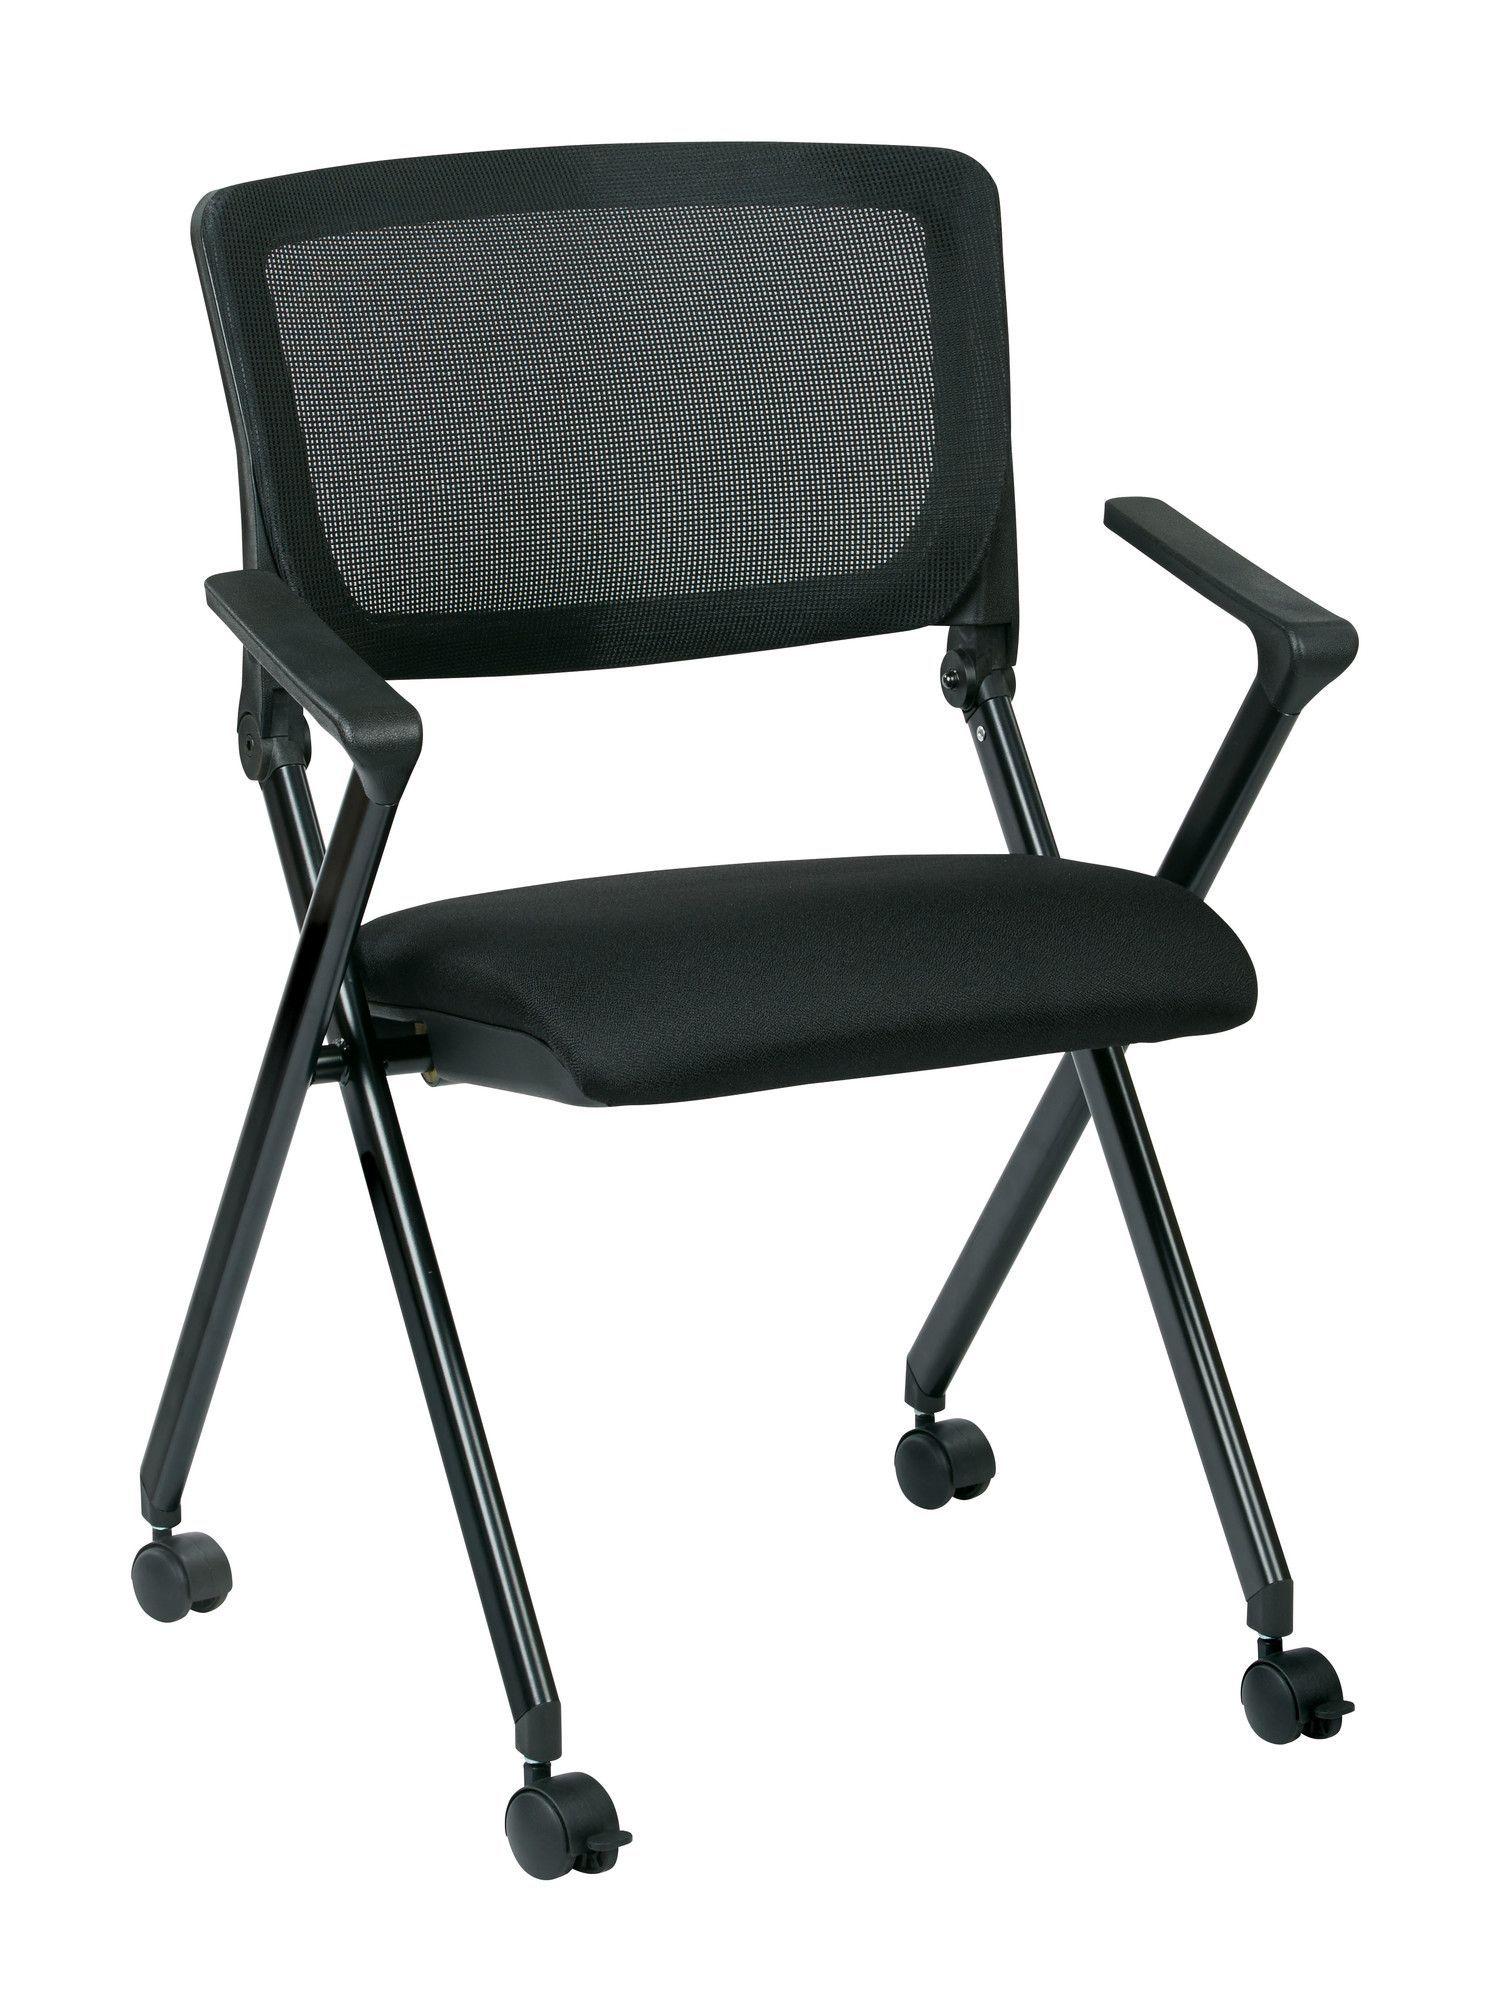 Work Smart Folding Chair Office star, Folding chair